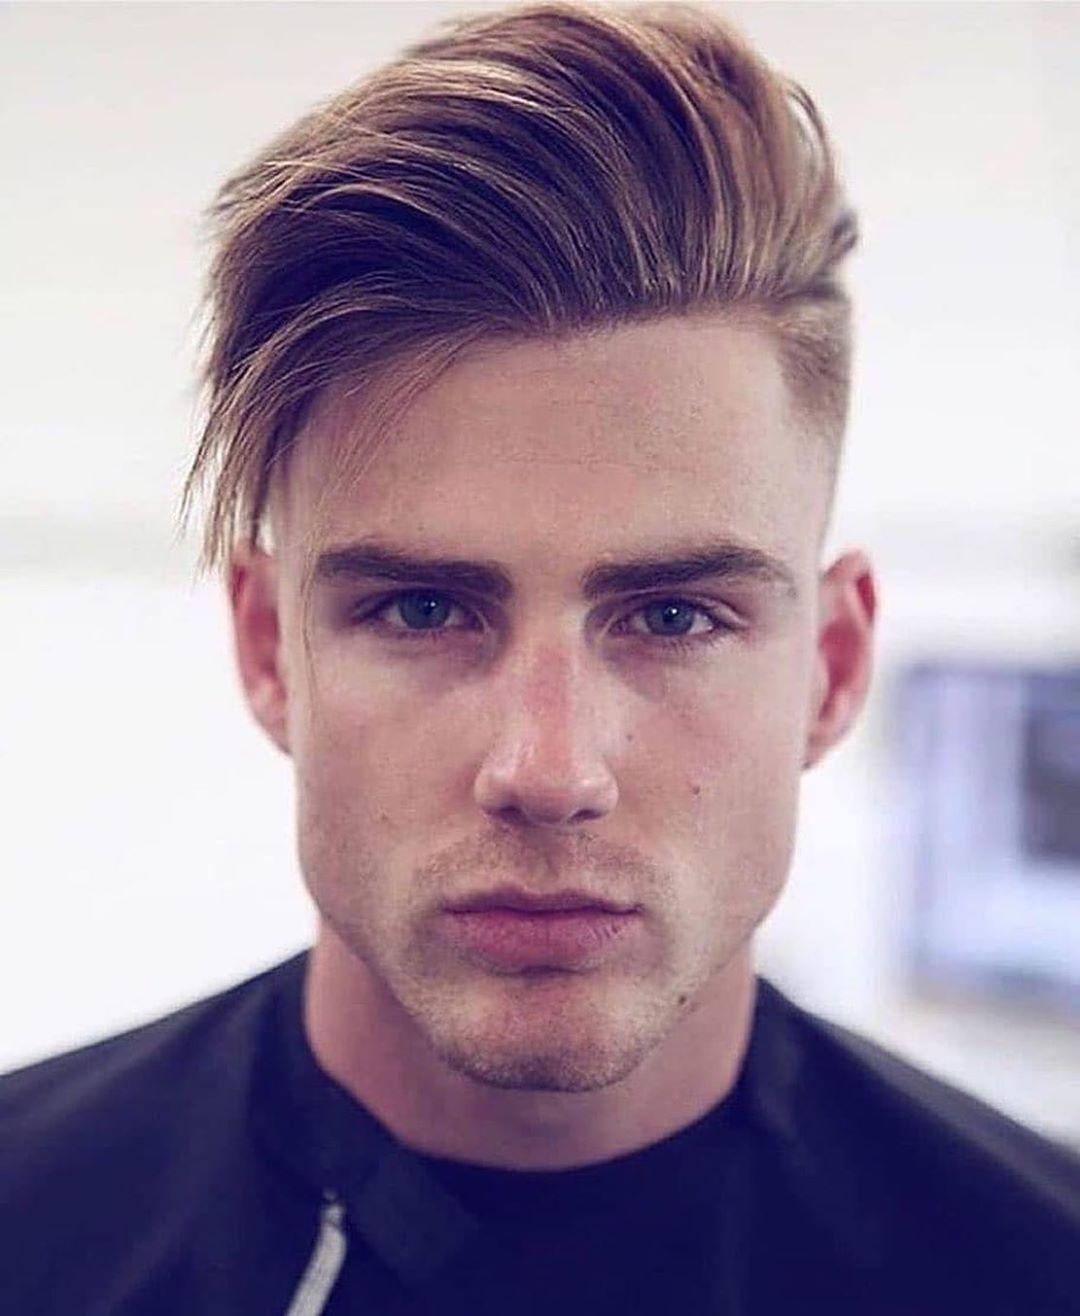 35 Inspirierende Mittlere Frisuren Fur Manner Seite Kurz Herrenfrisuren Haare Manner Haare Lang Wachsen Lassen Manner